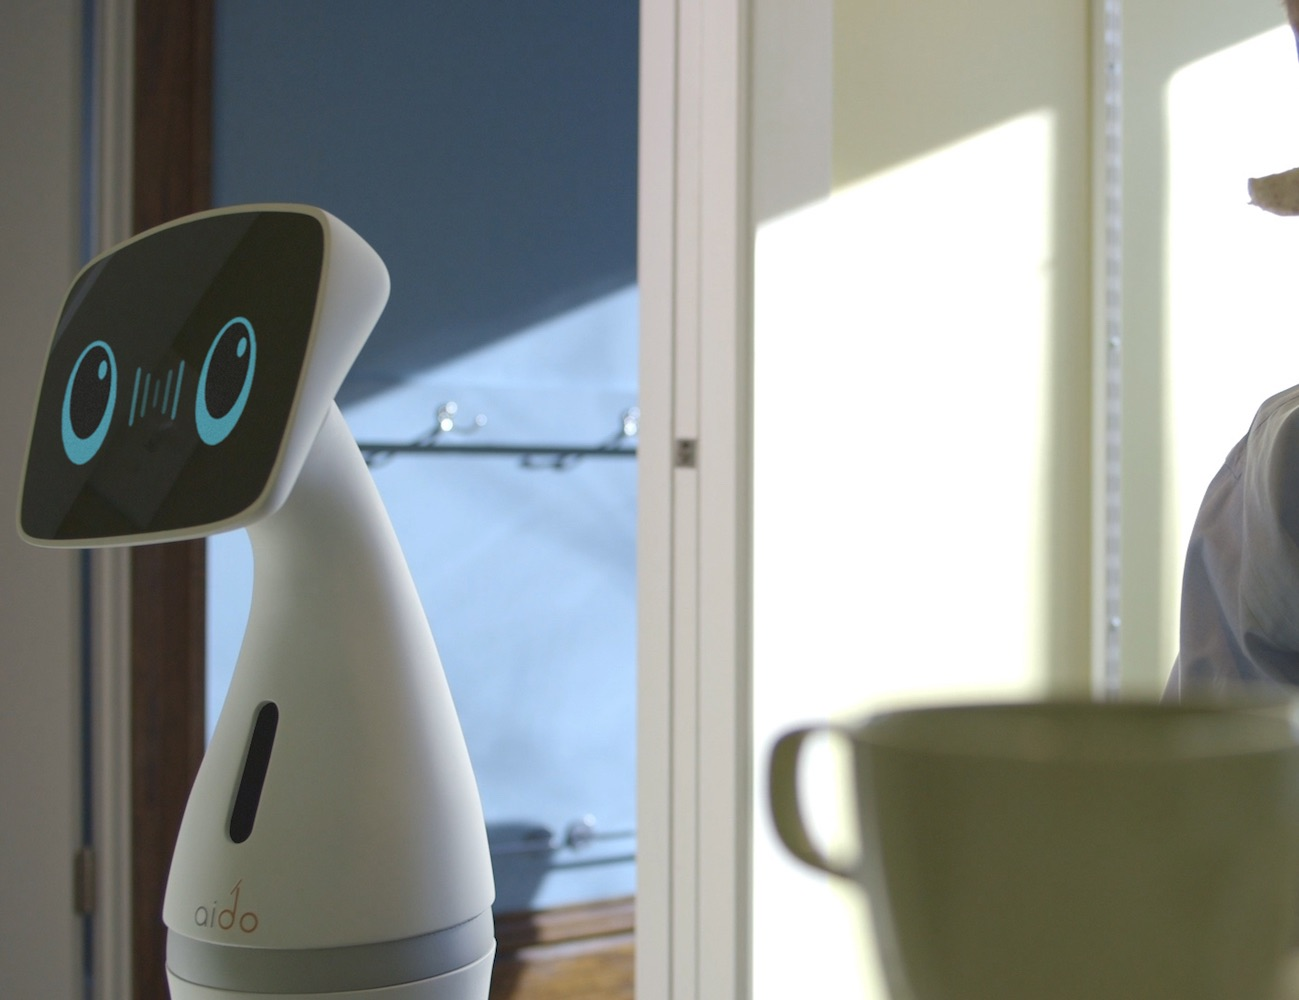 Aido – Next Gen Home Robot